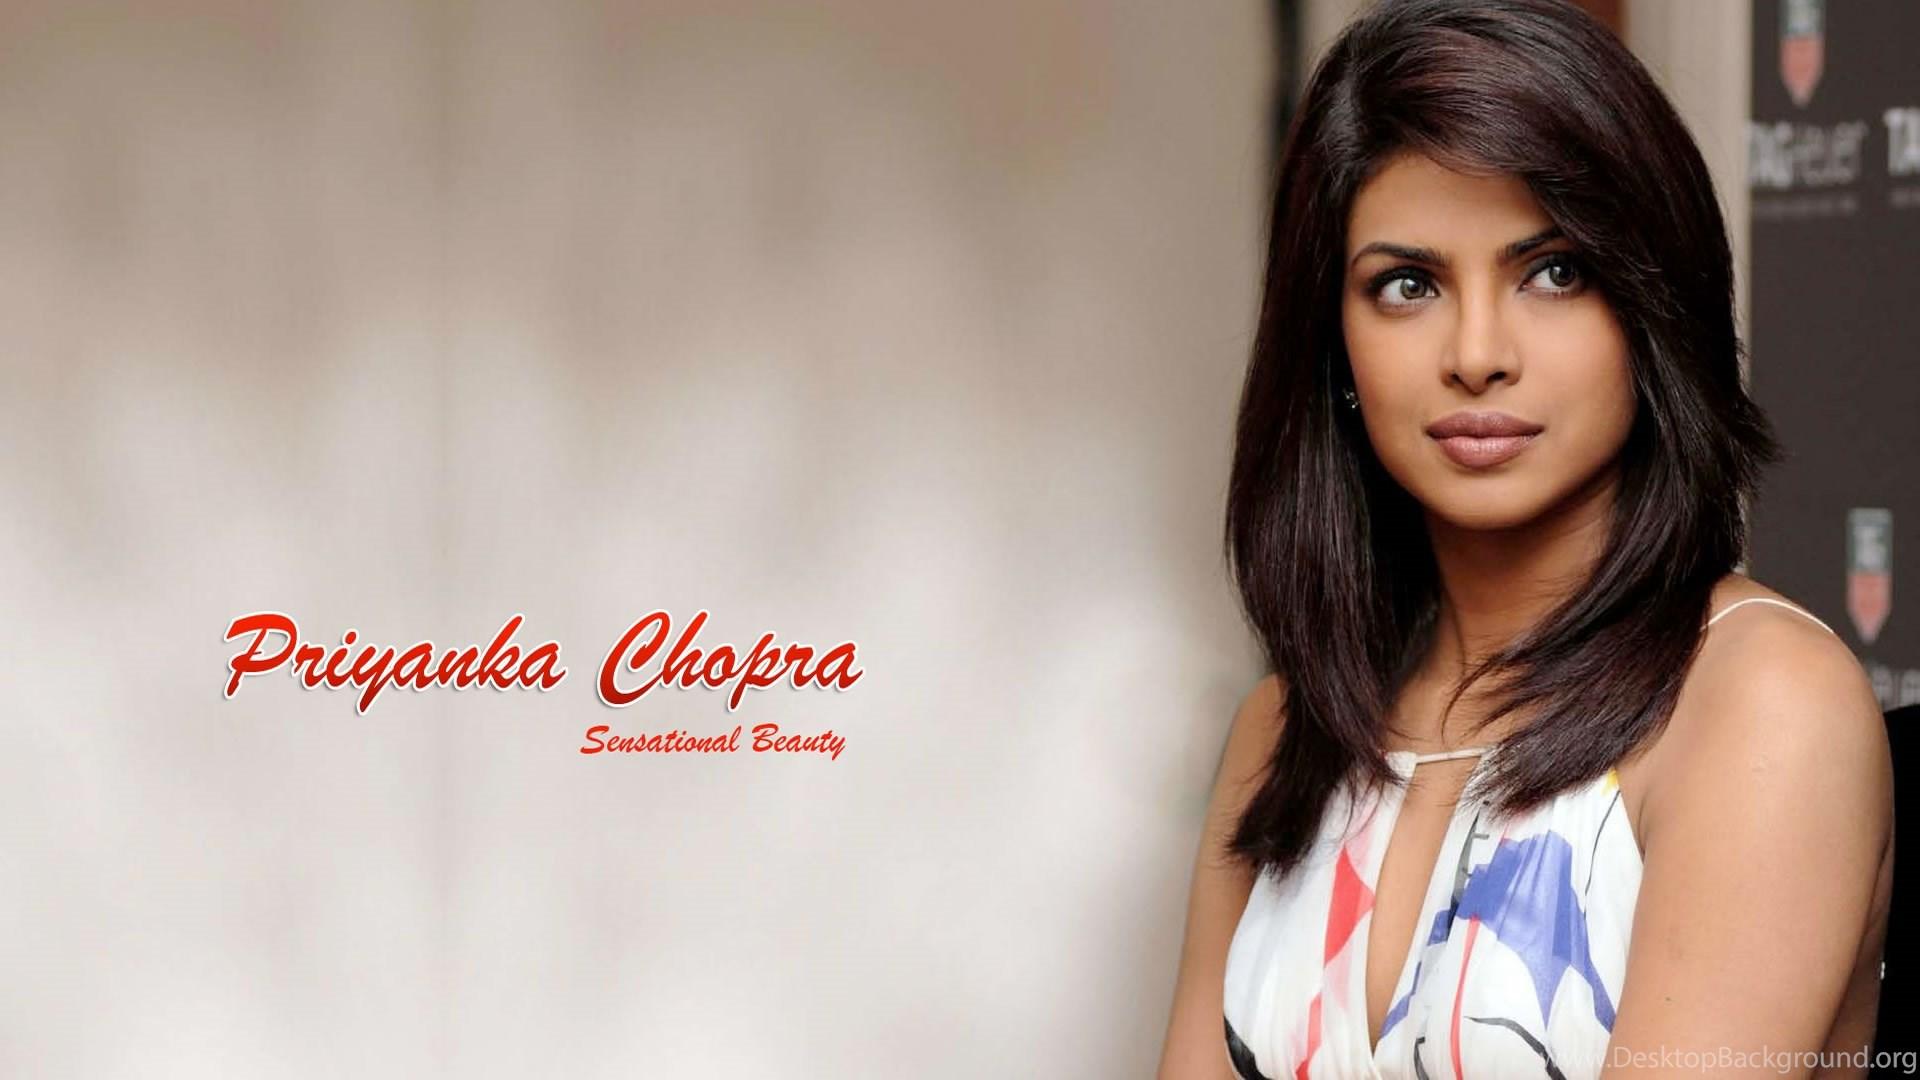 wallpapers jessica clement jung bollywood actress priyanka chopra